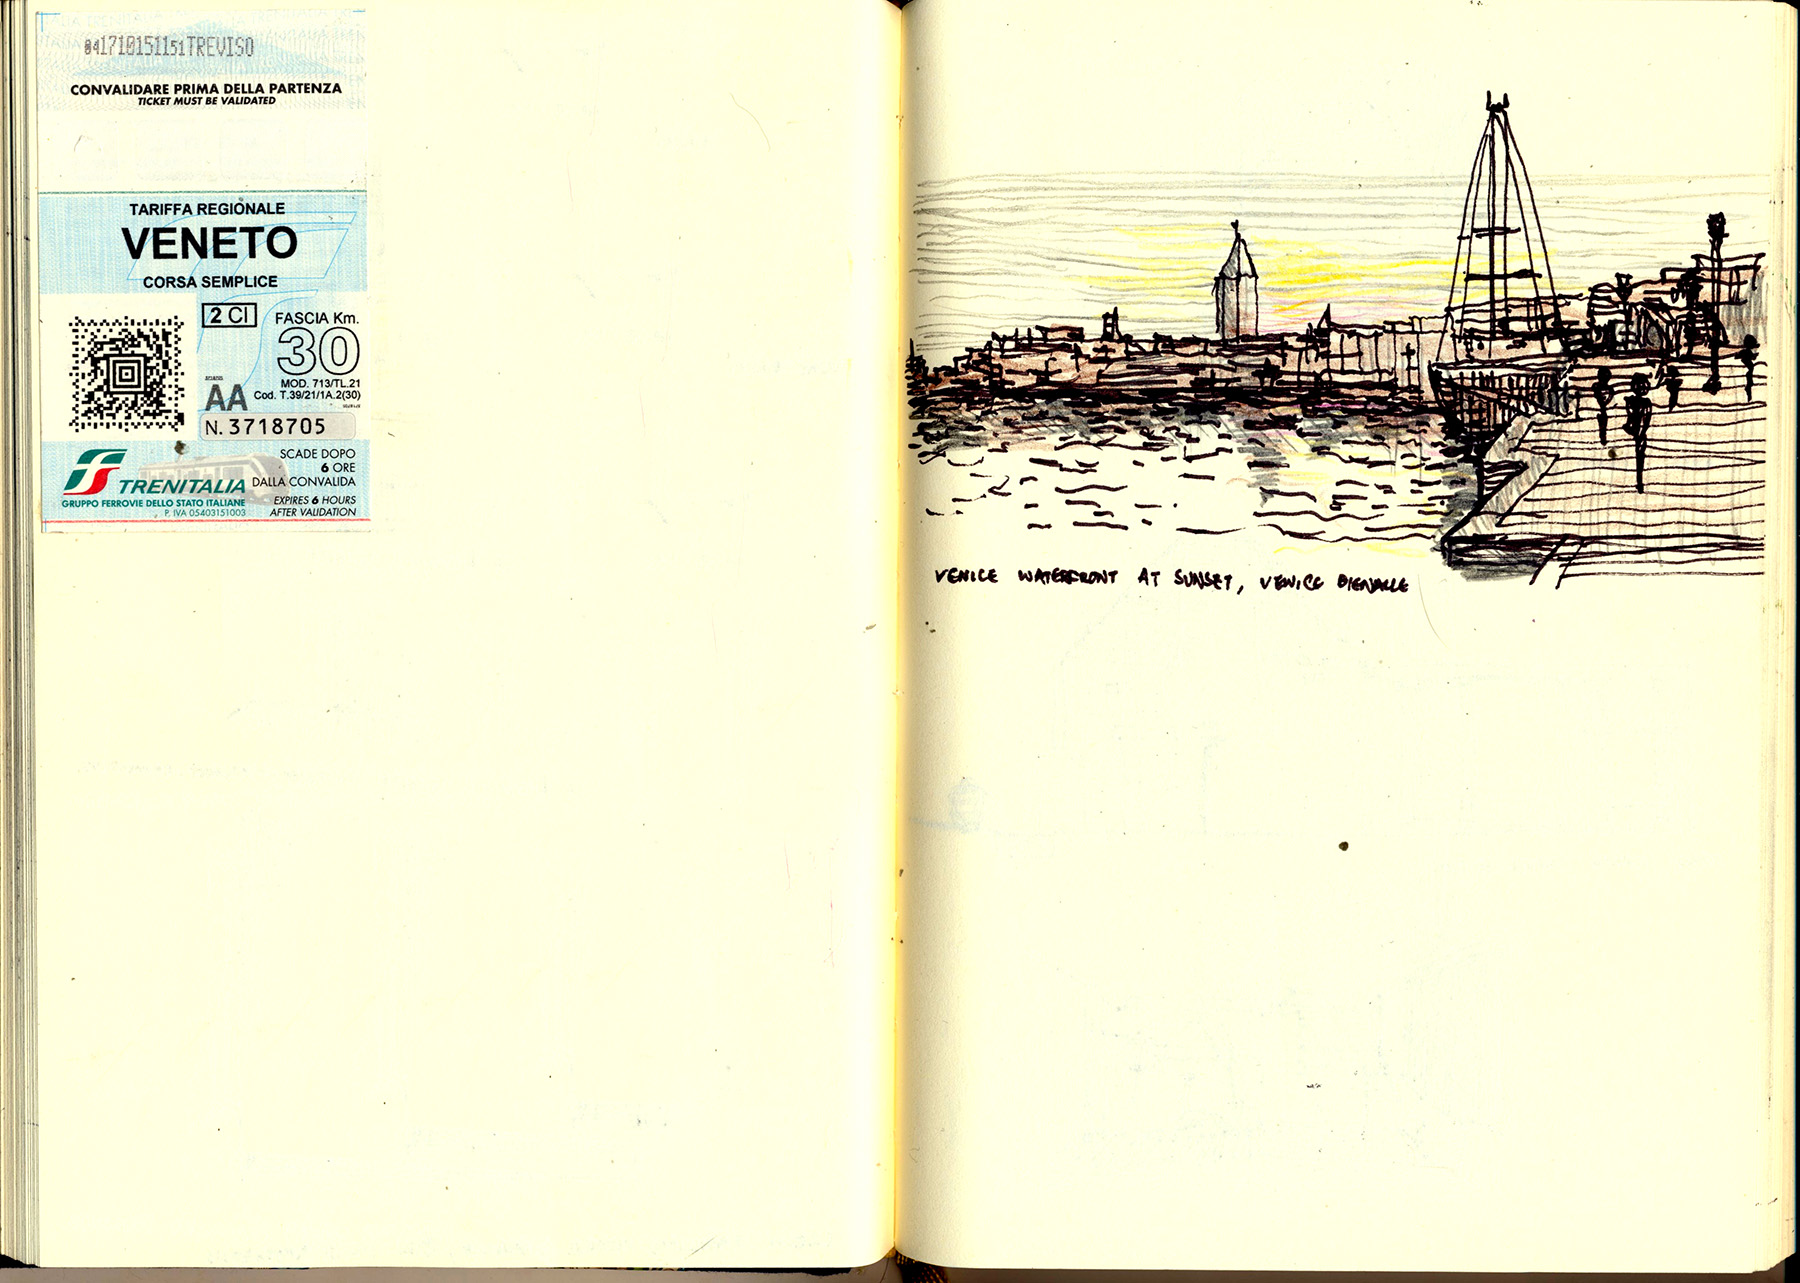 151020_VeniceSunset_WEB.jpg